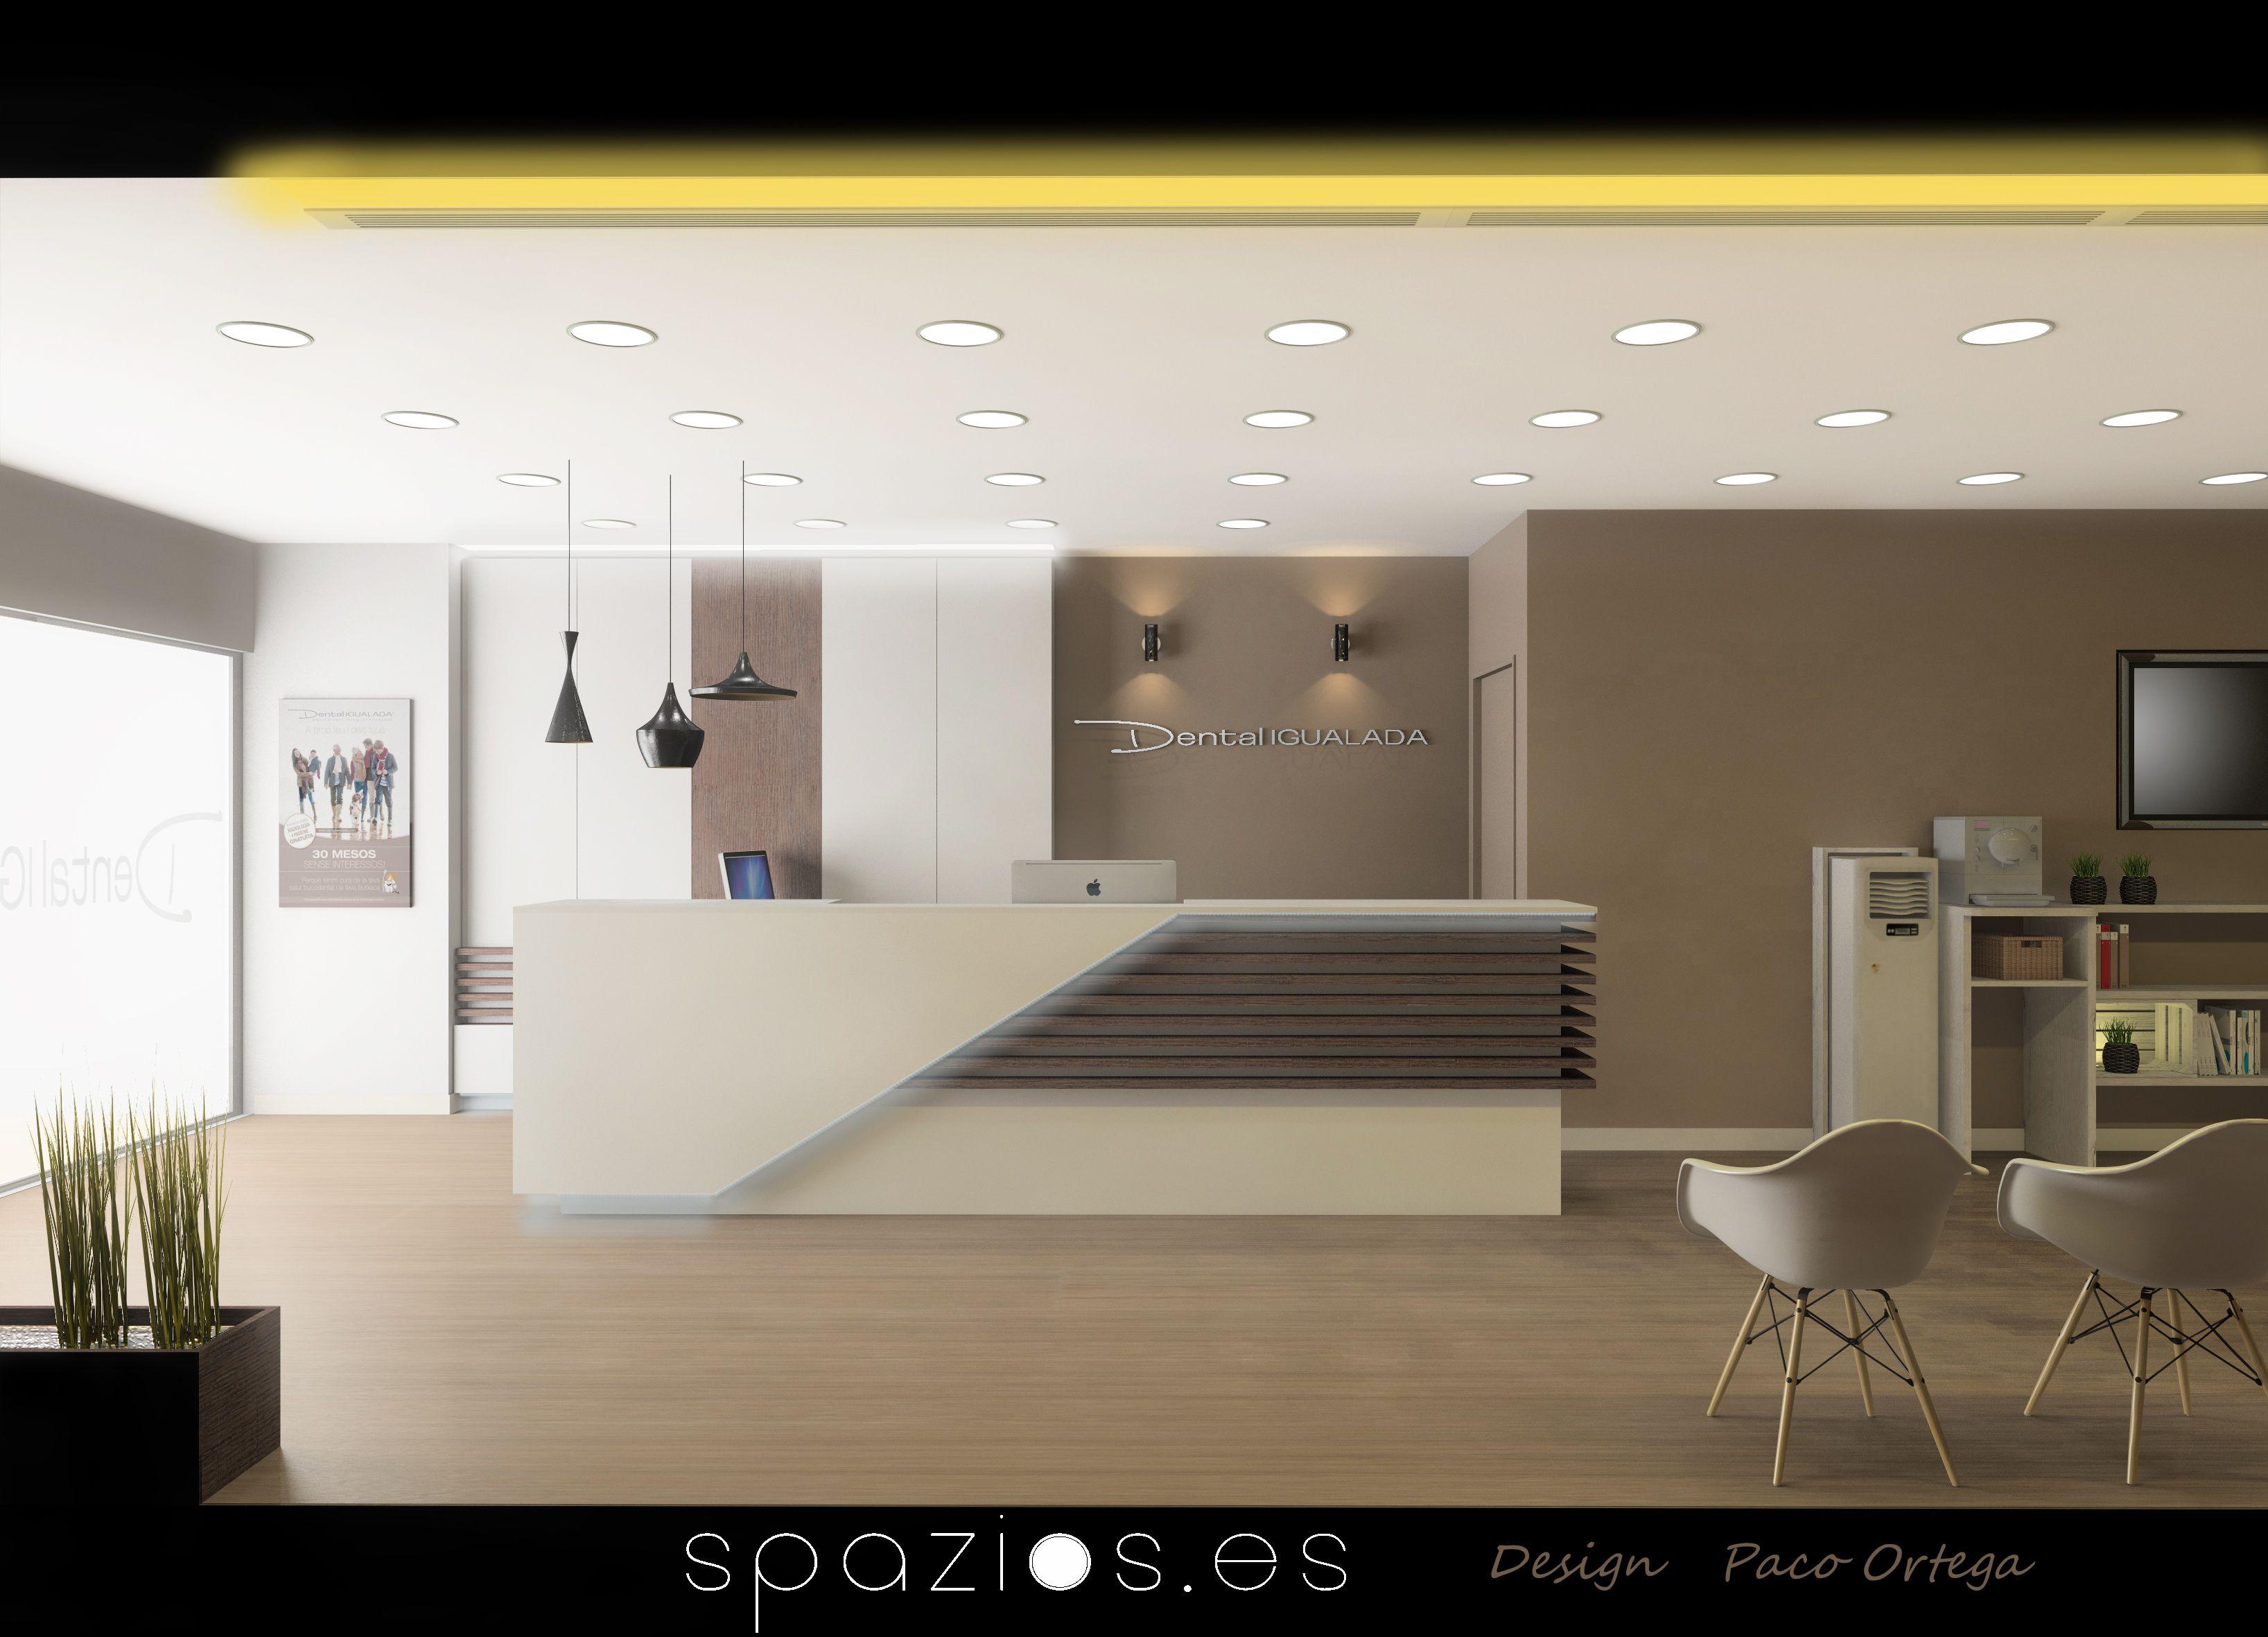 Reception Desk Idea Interior Design (Dental Clinic) By Paco Ortega